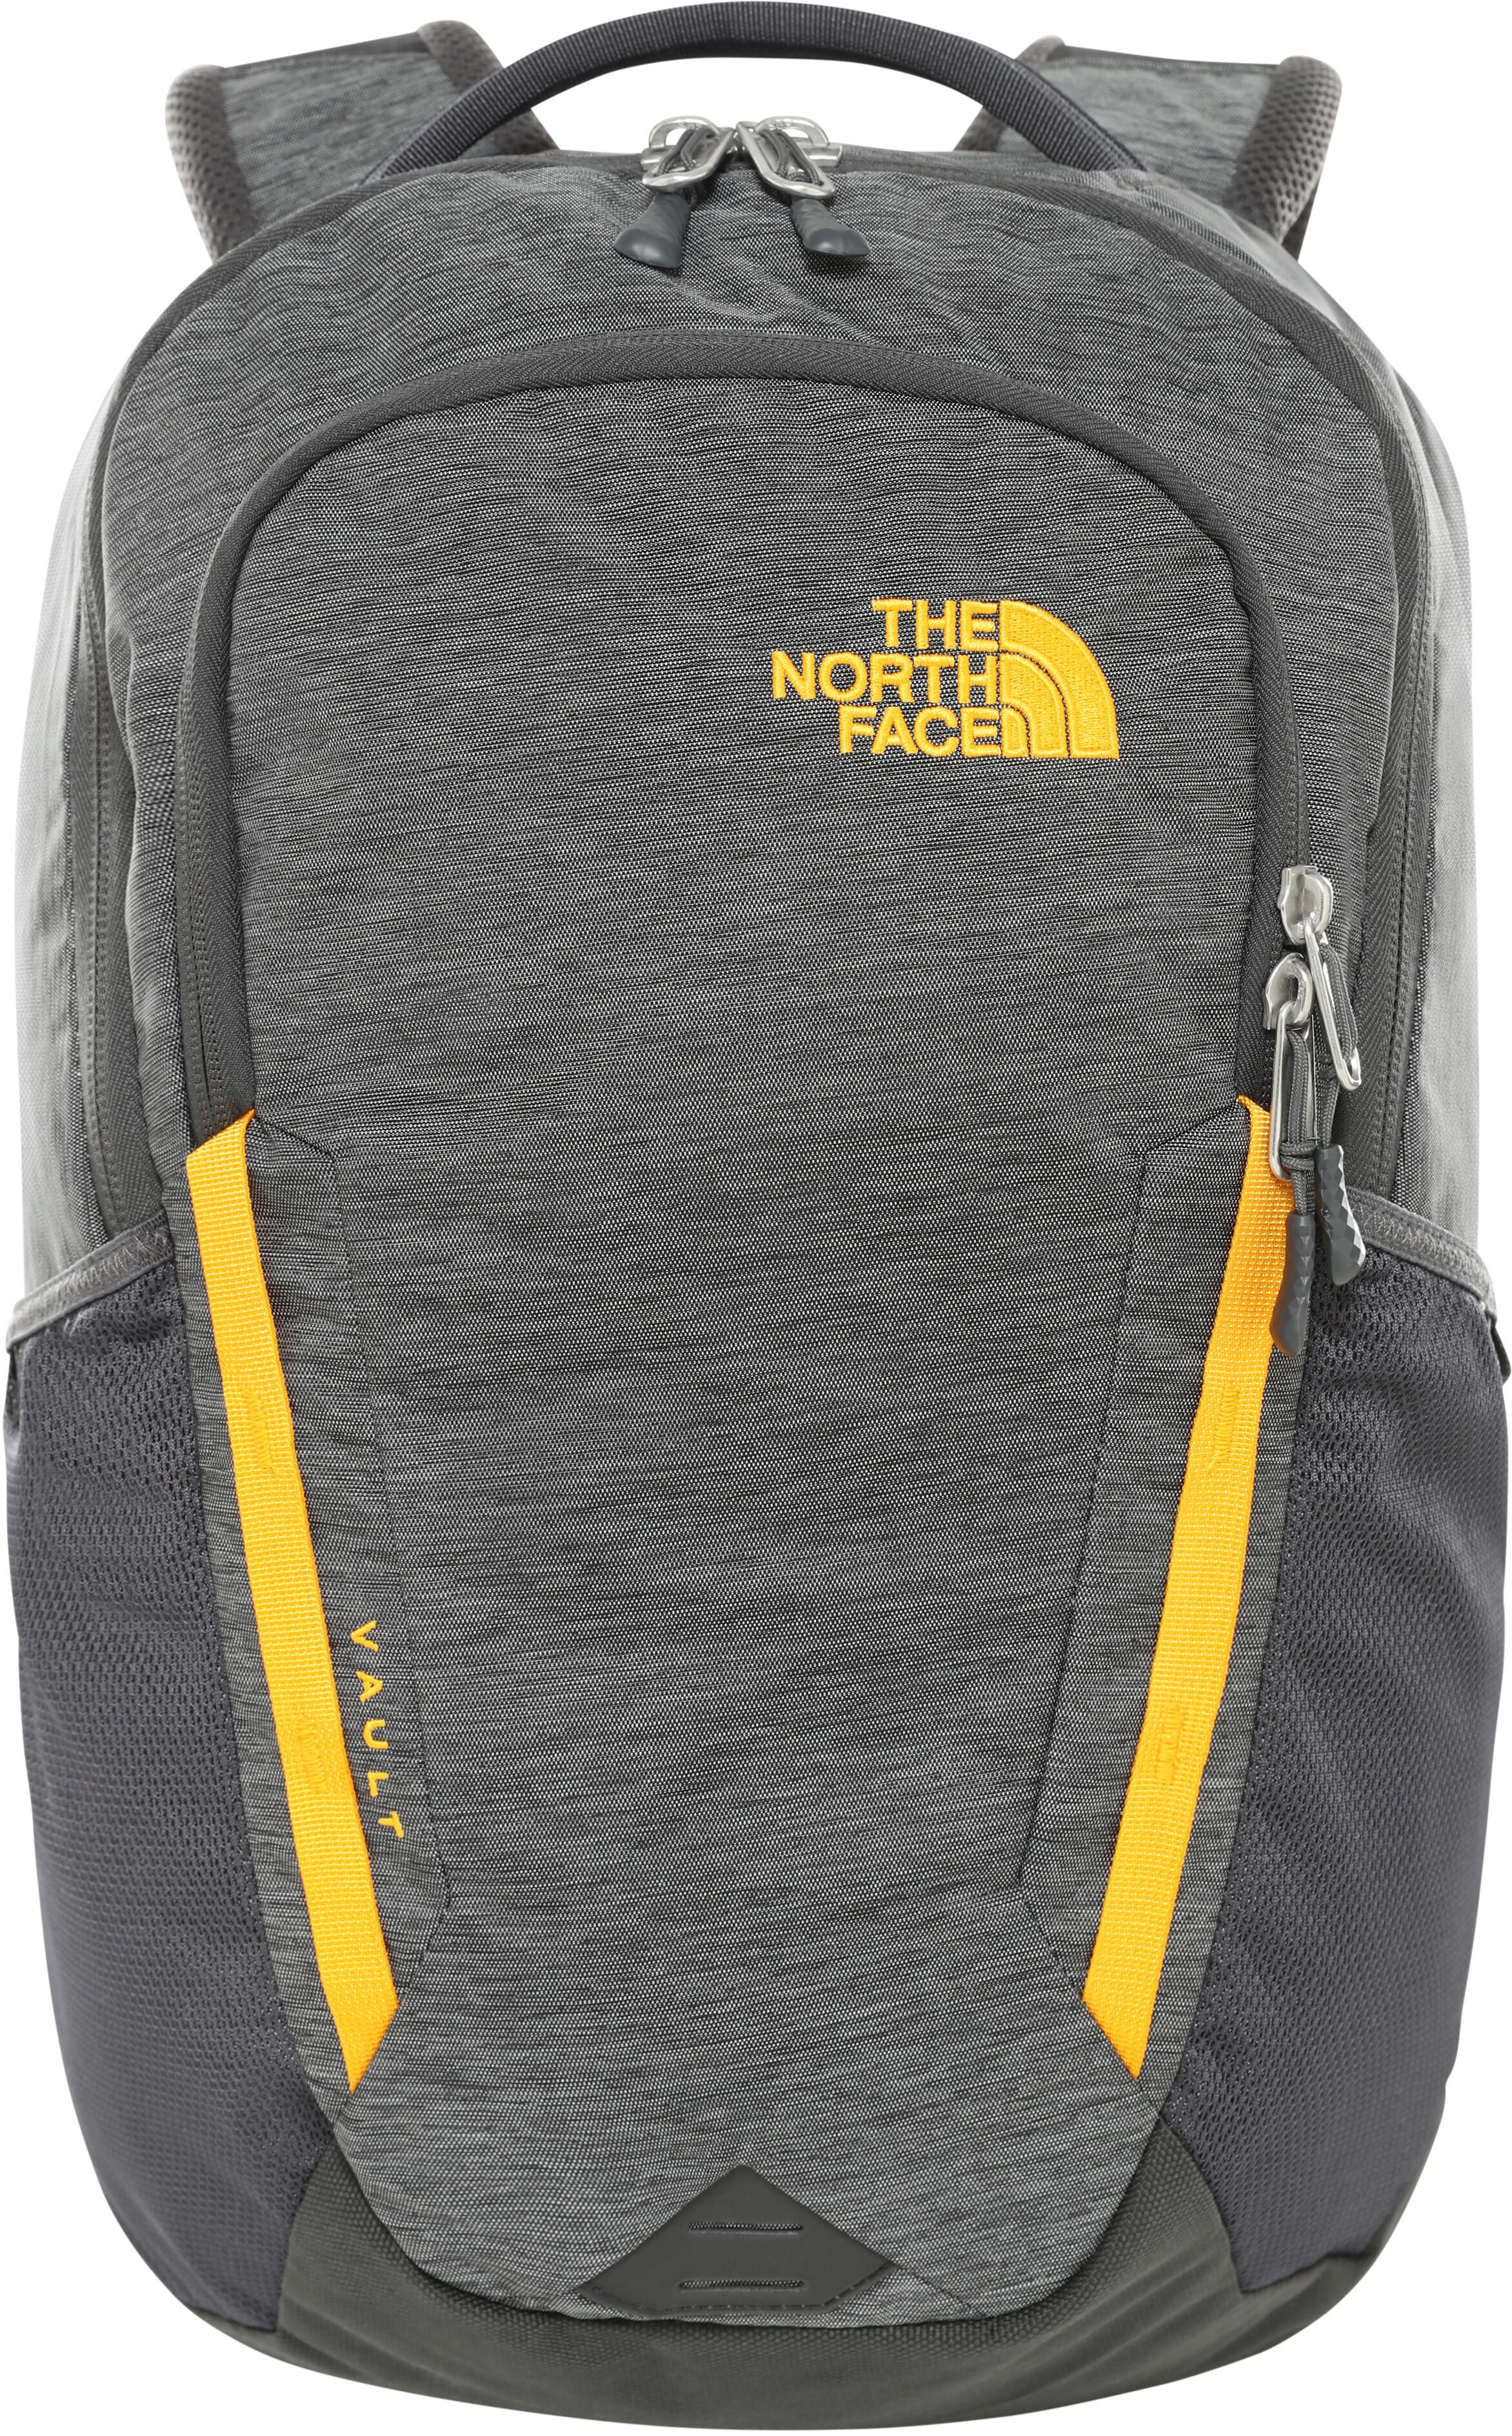 The North Face Vault Zaino grigio arancione e3af54743215